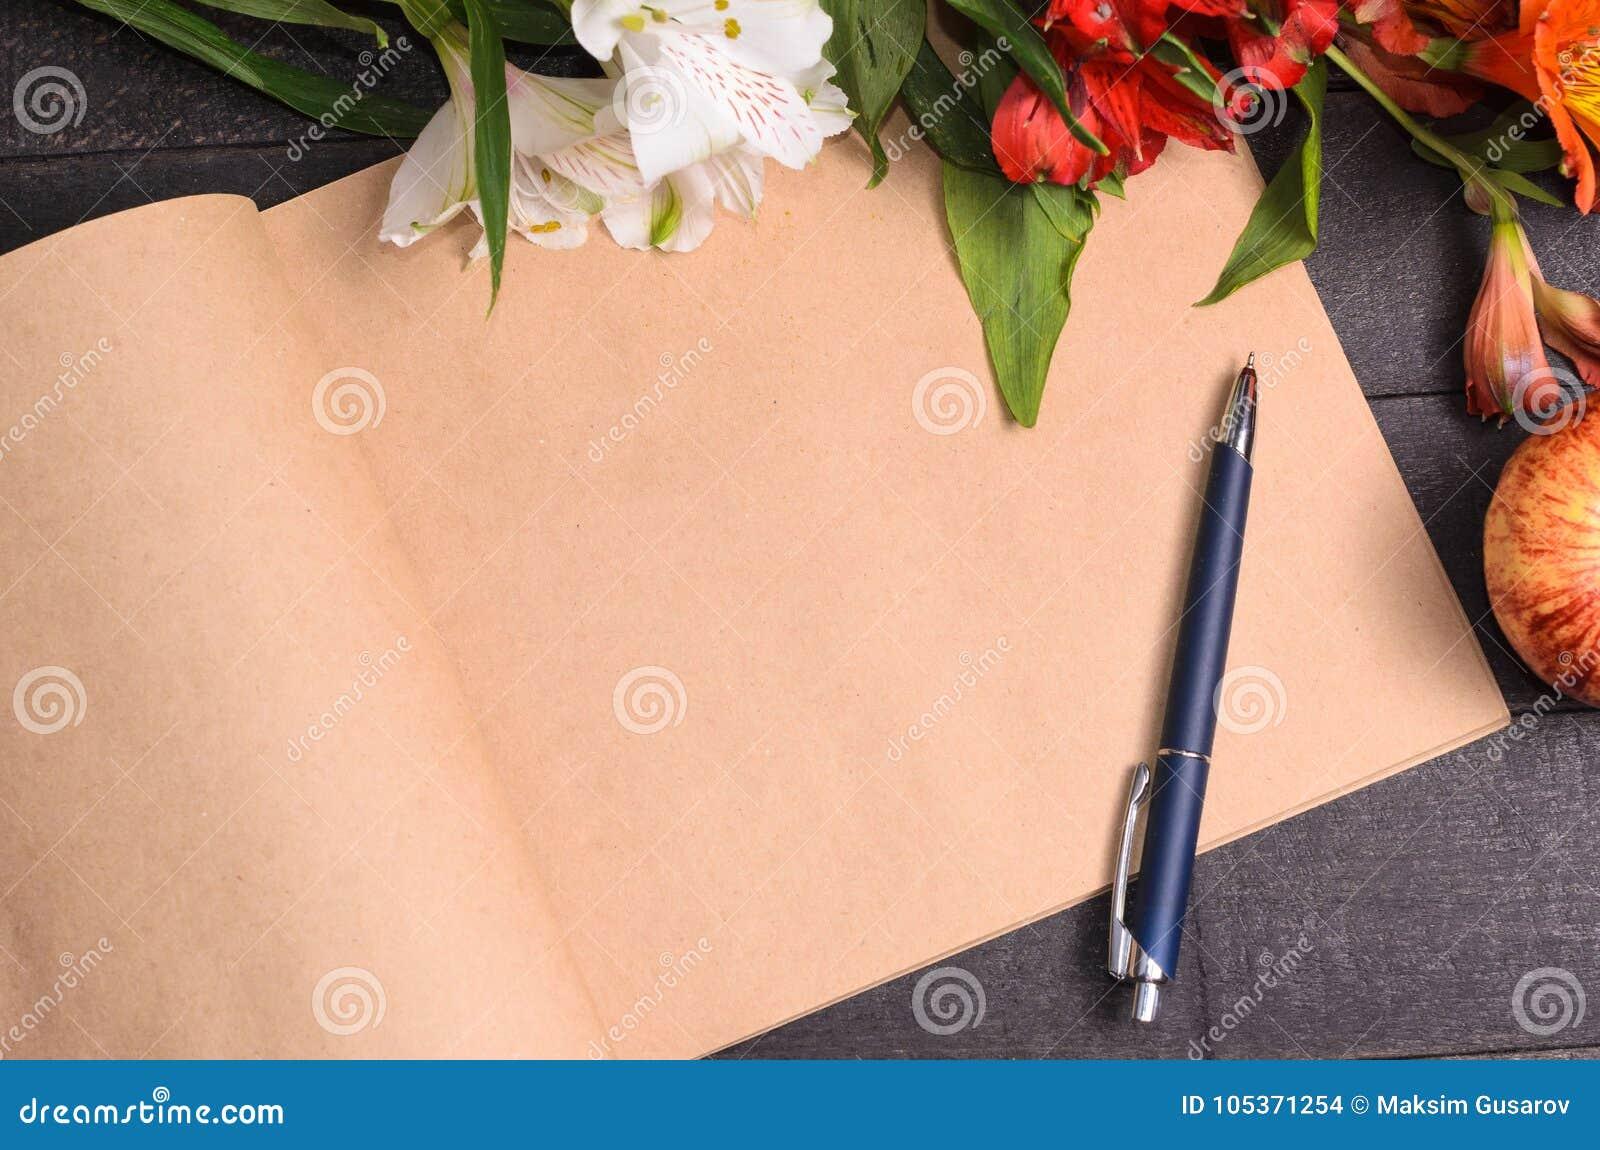 Love letter flower bouquet, free space